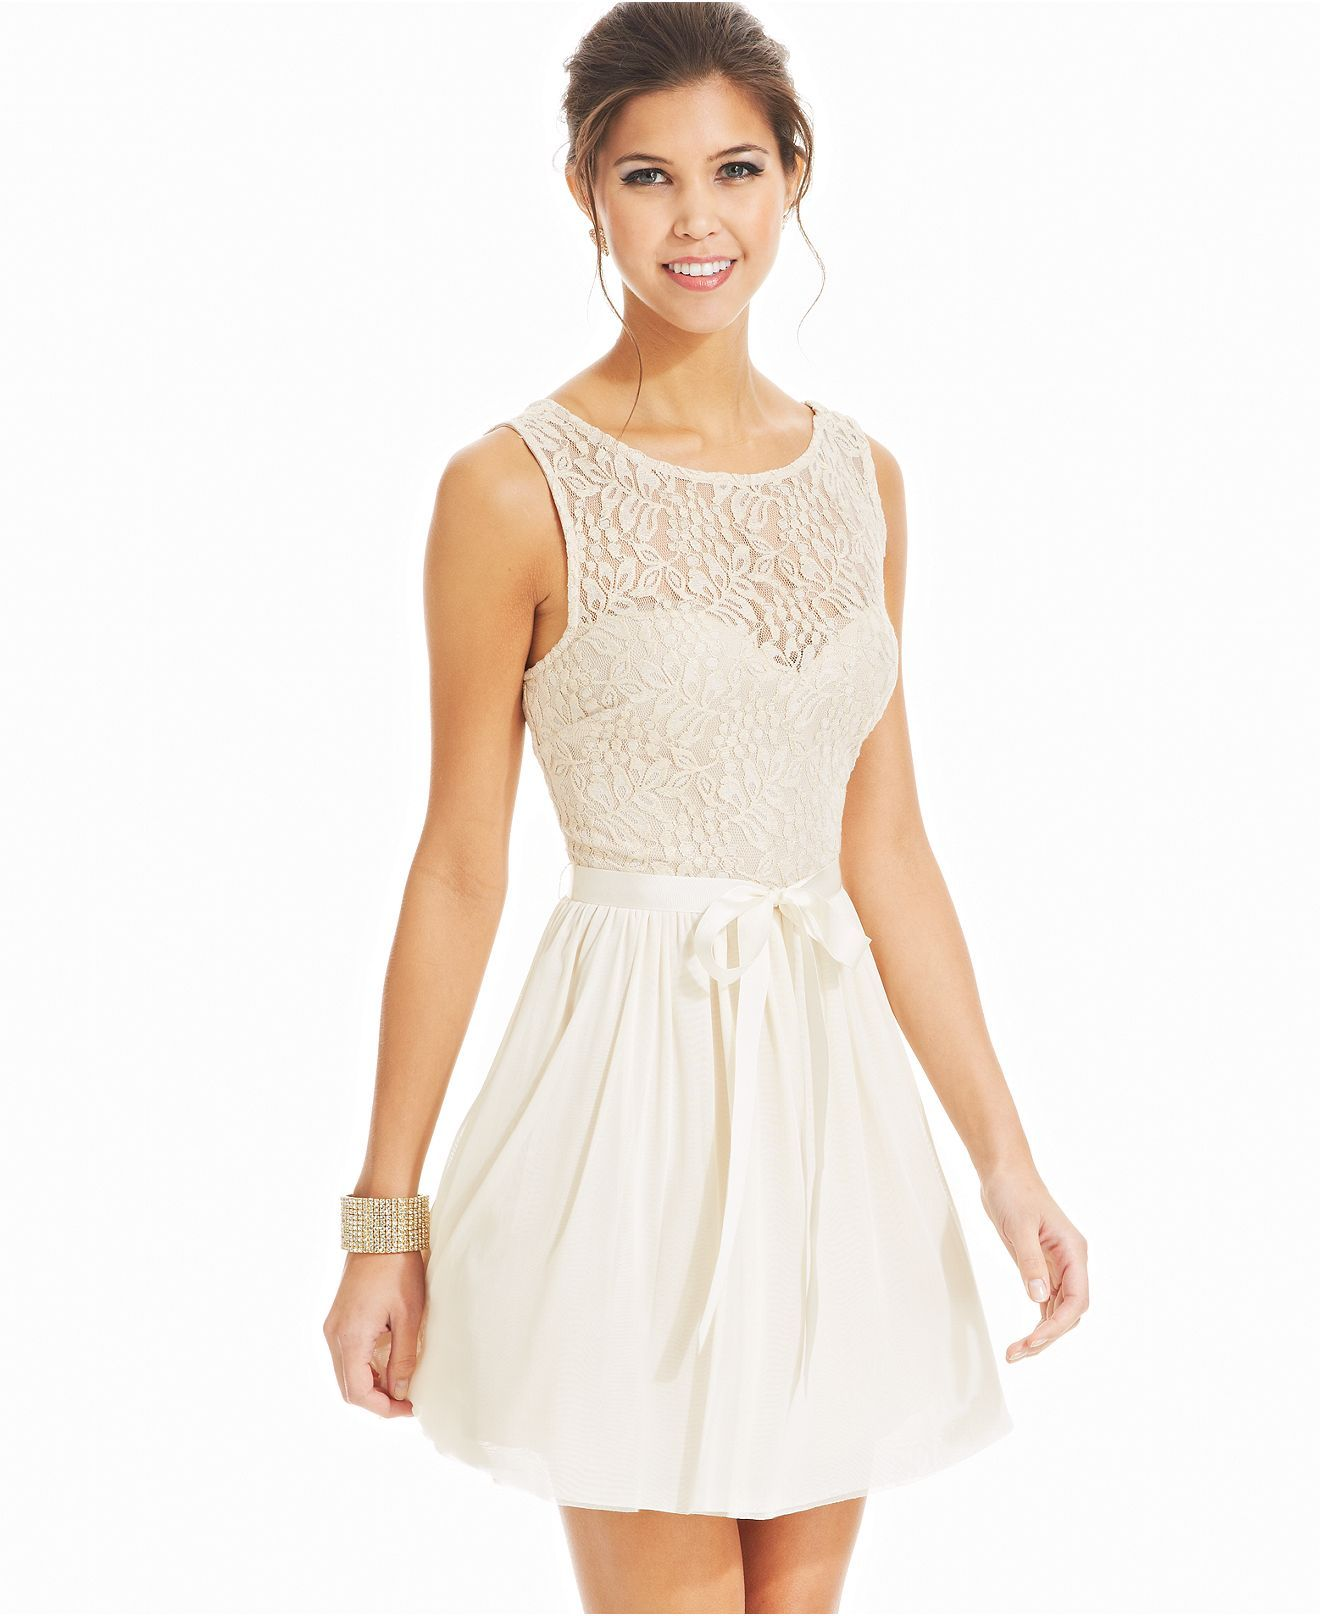 Speechless Juniors Dress, Sleeveless Lace Illusion - Juniors Dresses ...